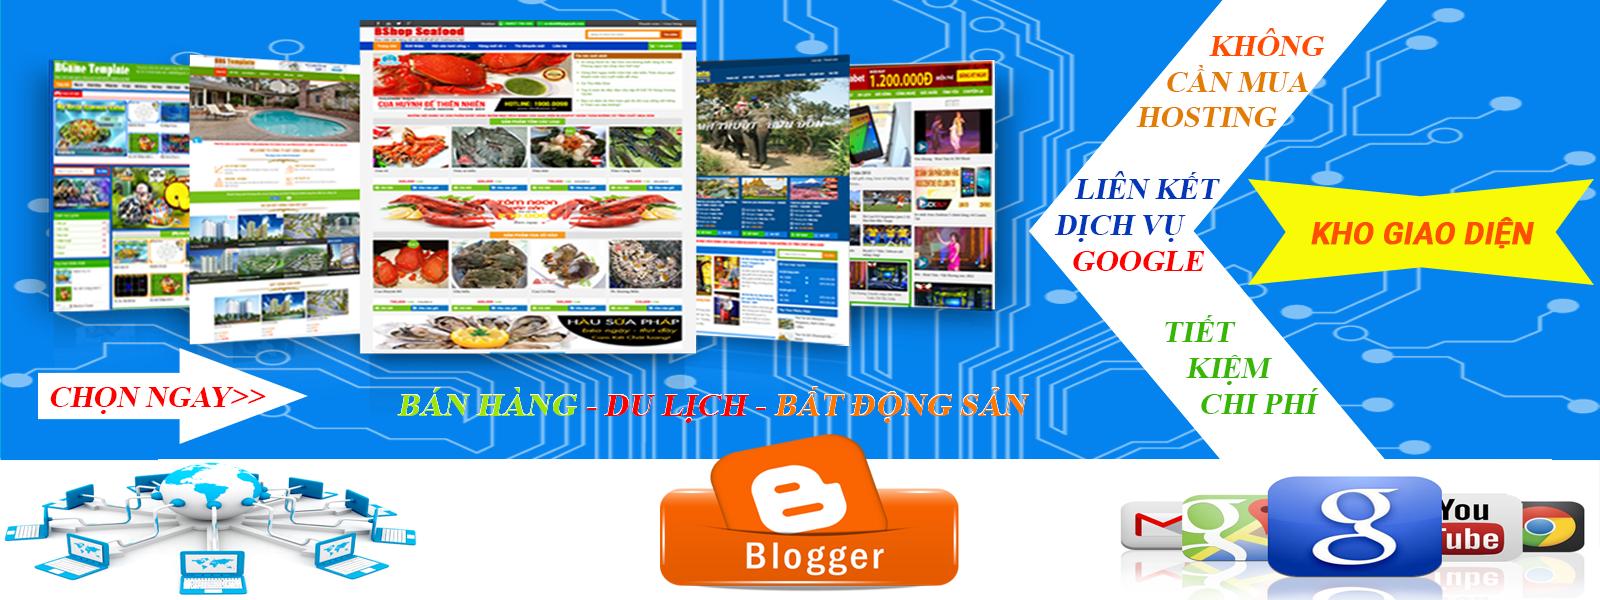 Kho giao diện Blogspot